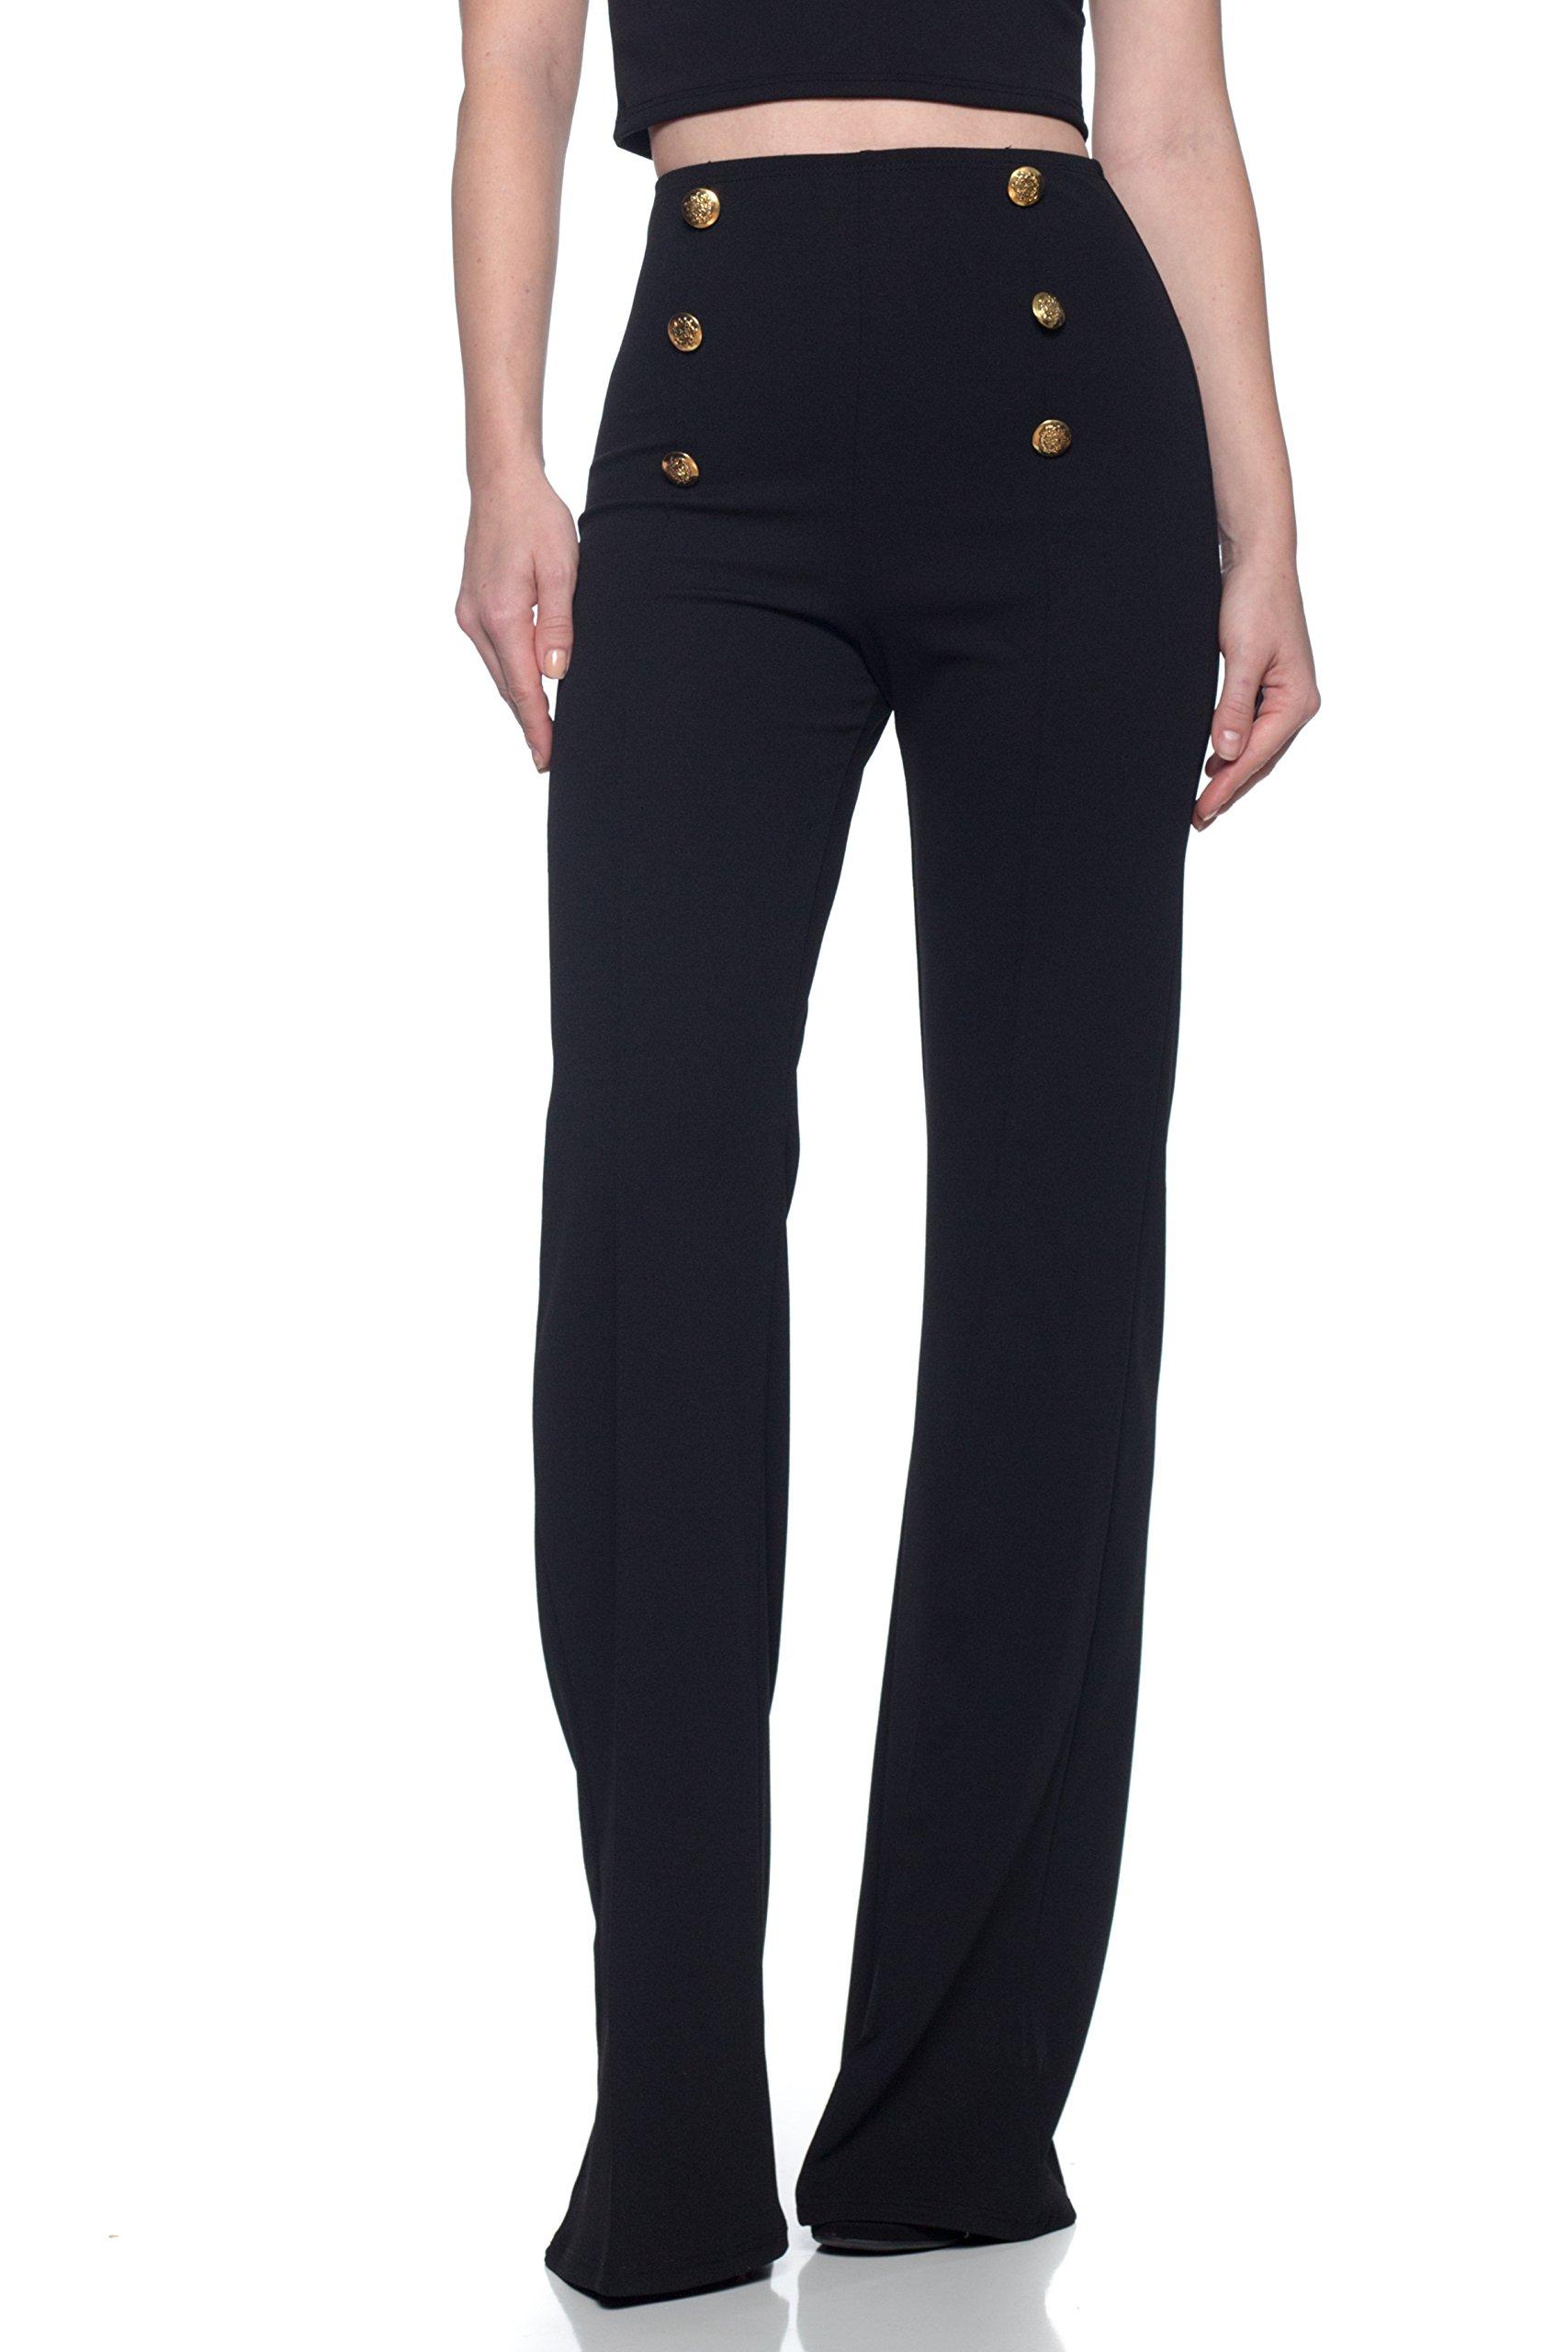 Women's J2 Love High Waist Sailor Bell Bottom Flare Pants, Medium, Black